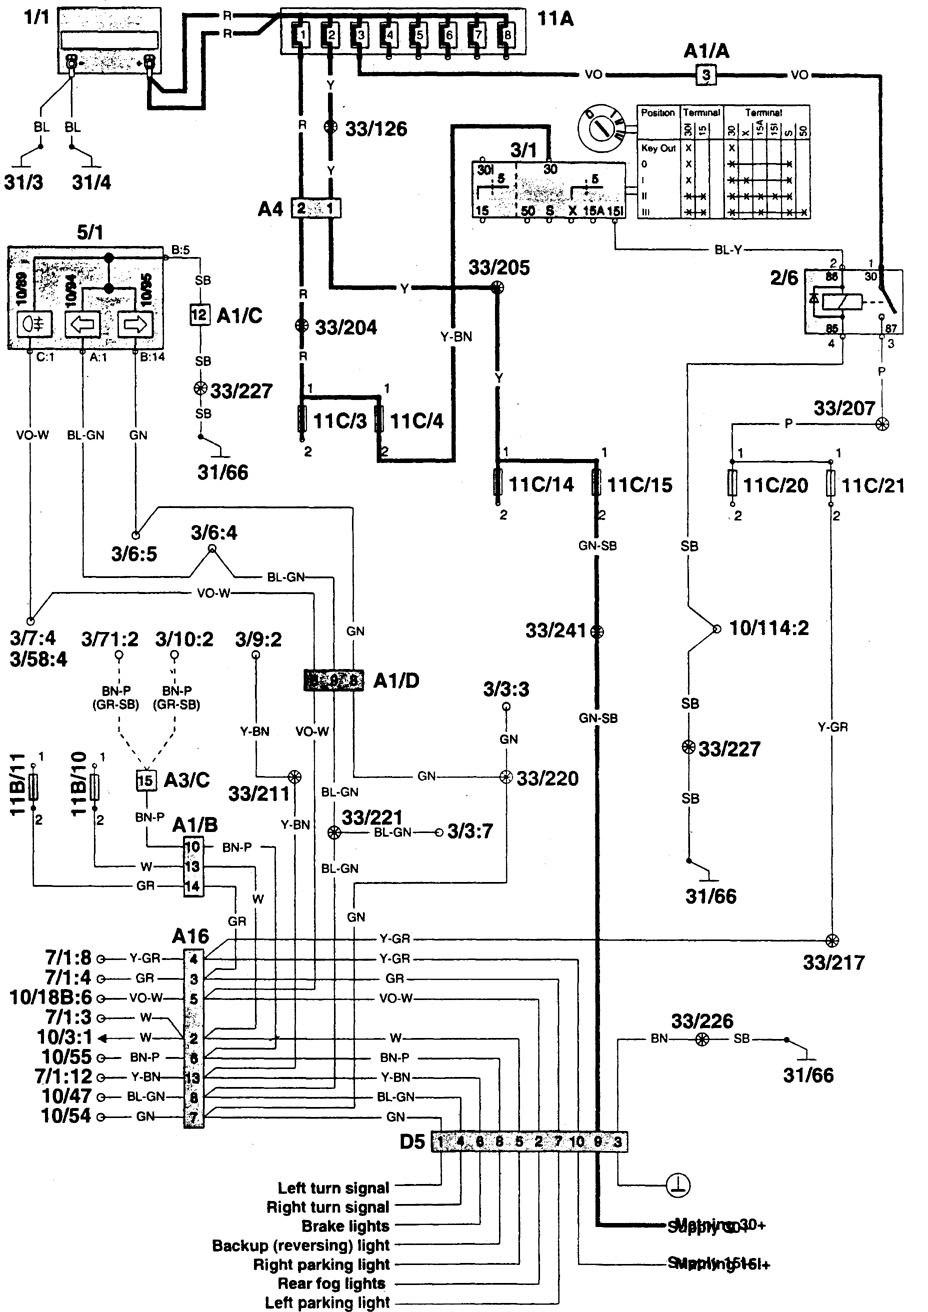 volvo 960  1996  - wiring diagrams  camper